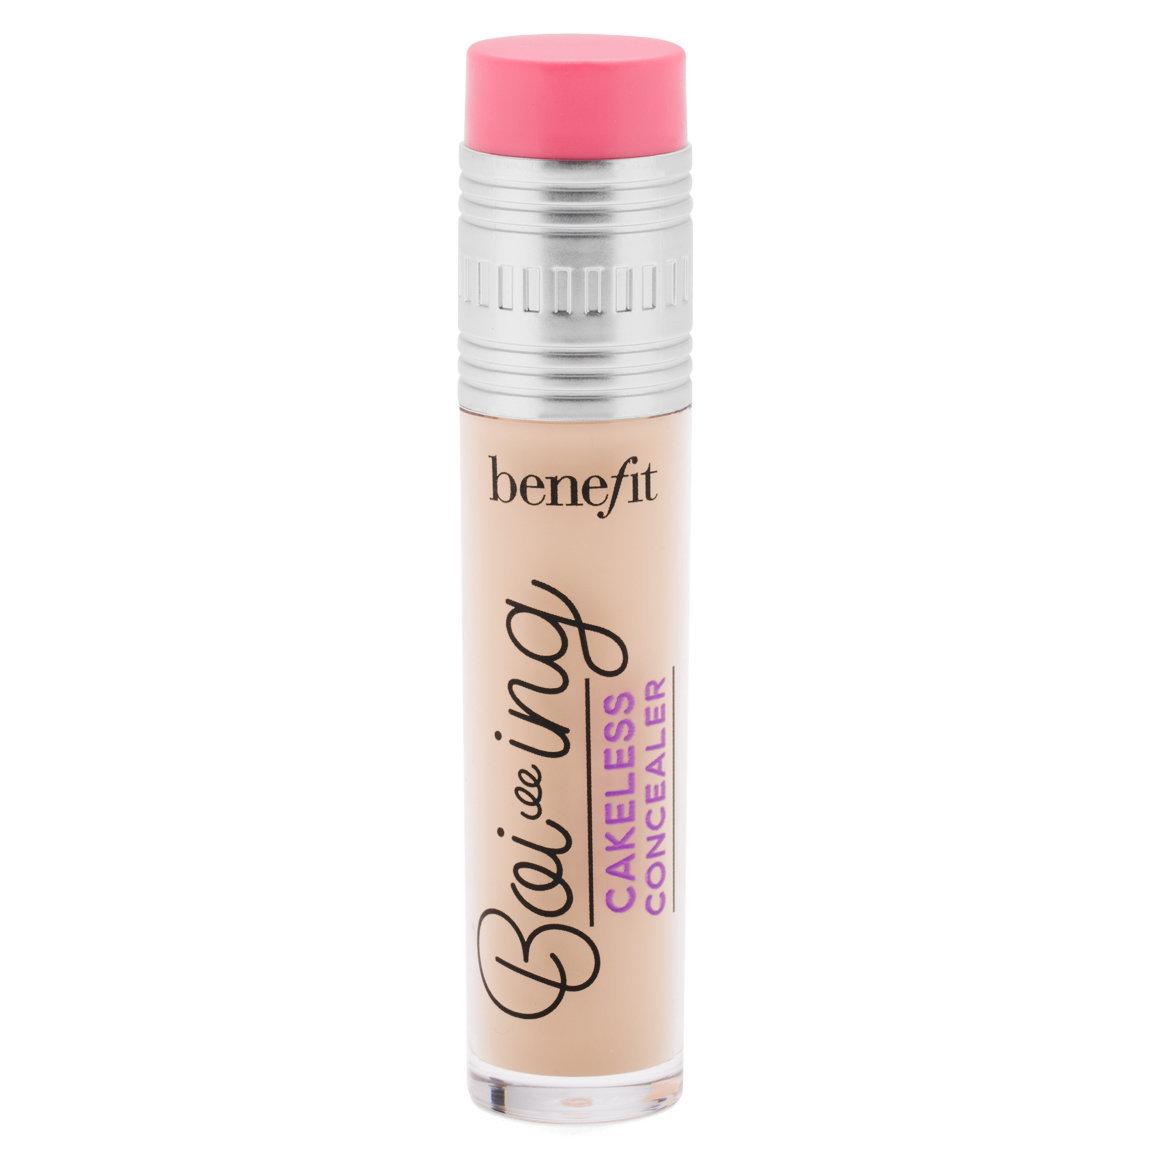 Benefit Cosmetics Boi-ing Cakeless Full Coverage Waterproof Liquid Concealer 2 Fair Warm alternative view 1.